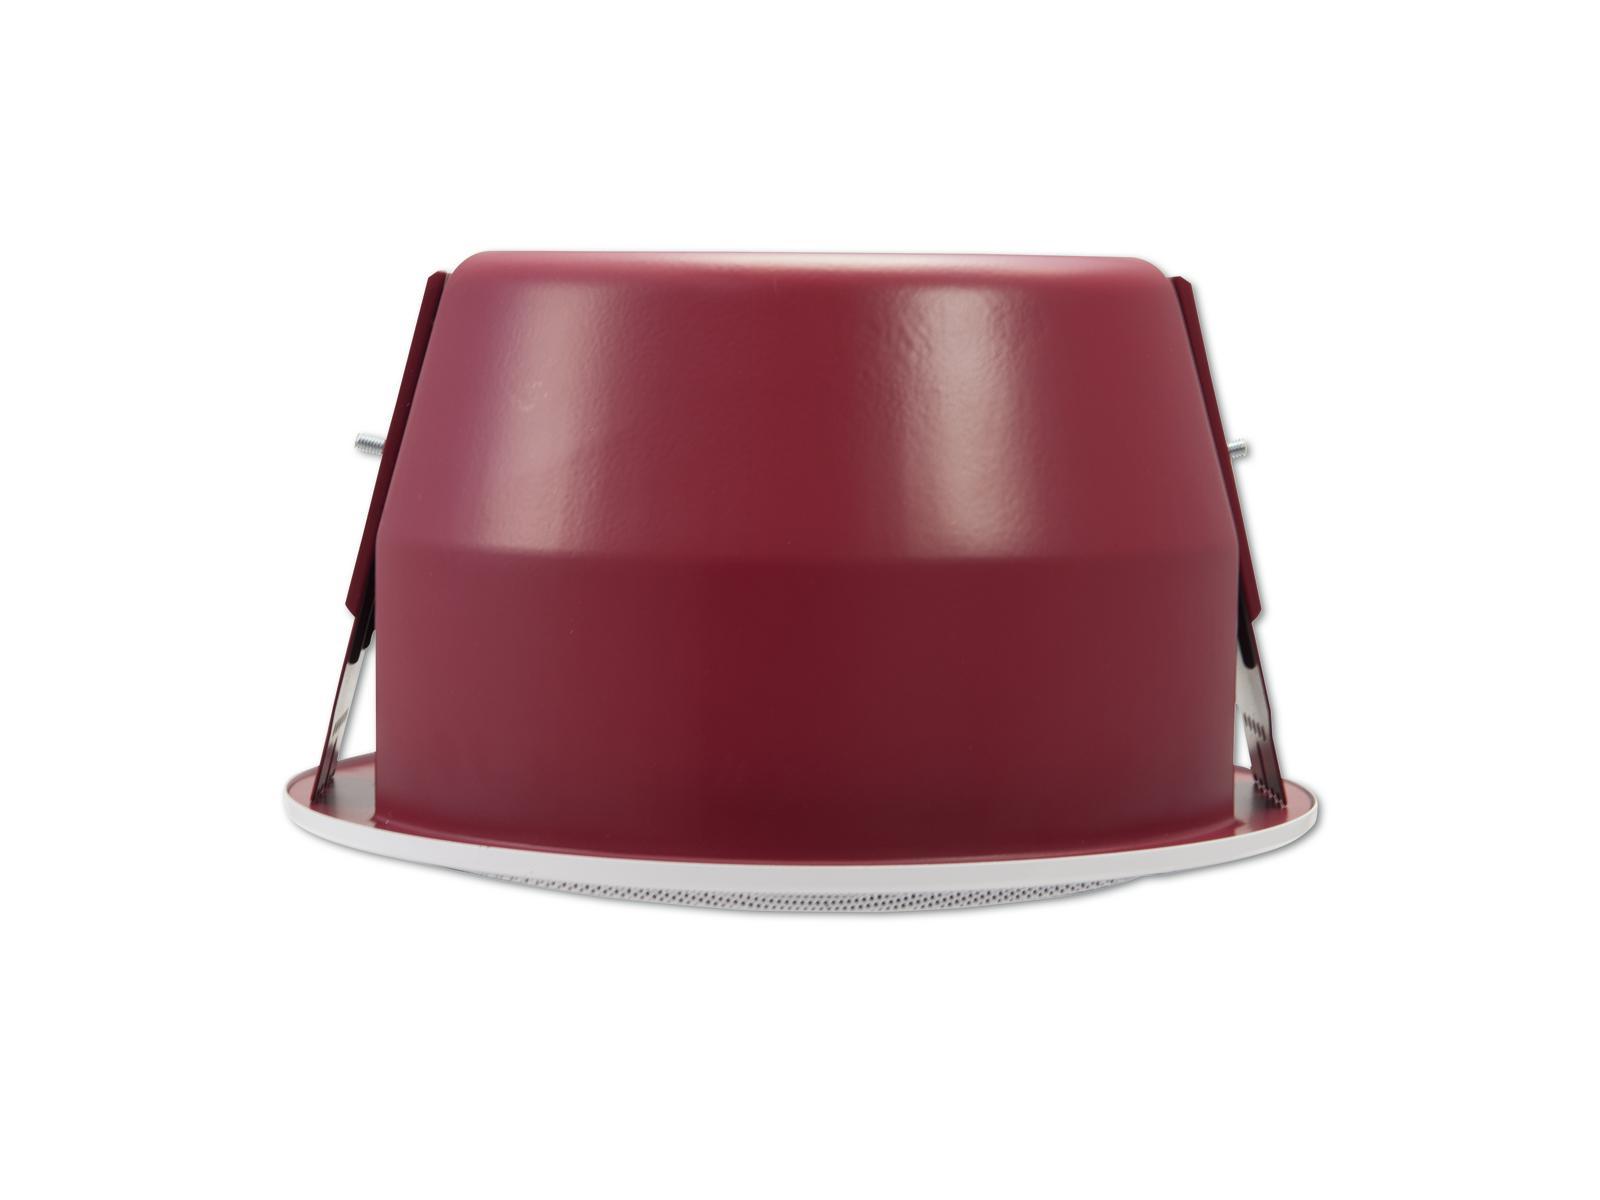 Cassa diffusore da soffitto parete 6 watt HONEYWELL  L-VCM6B/IT EN54